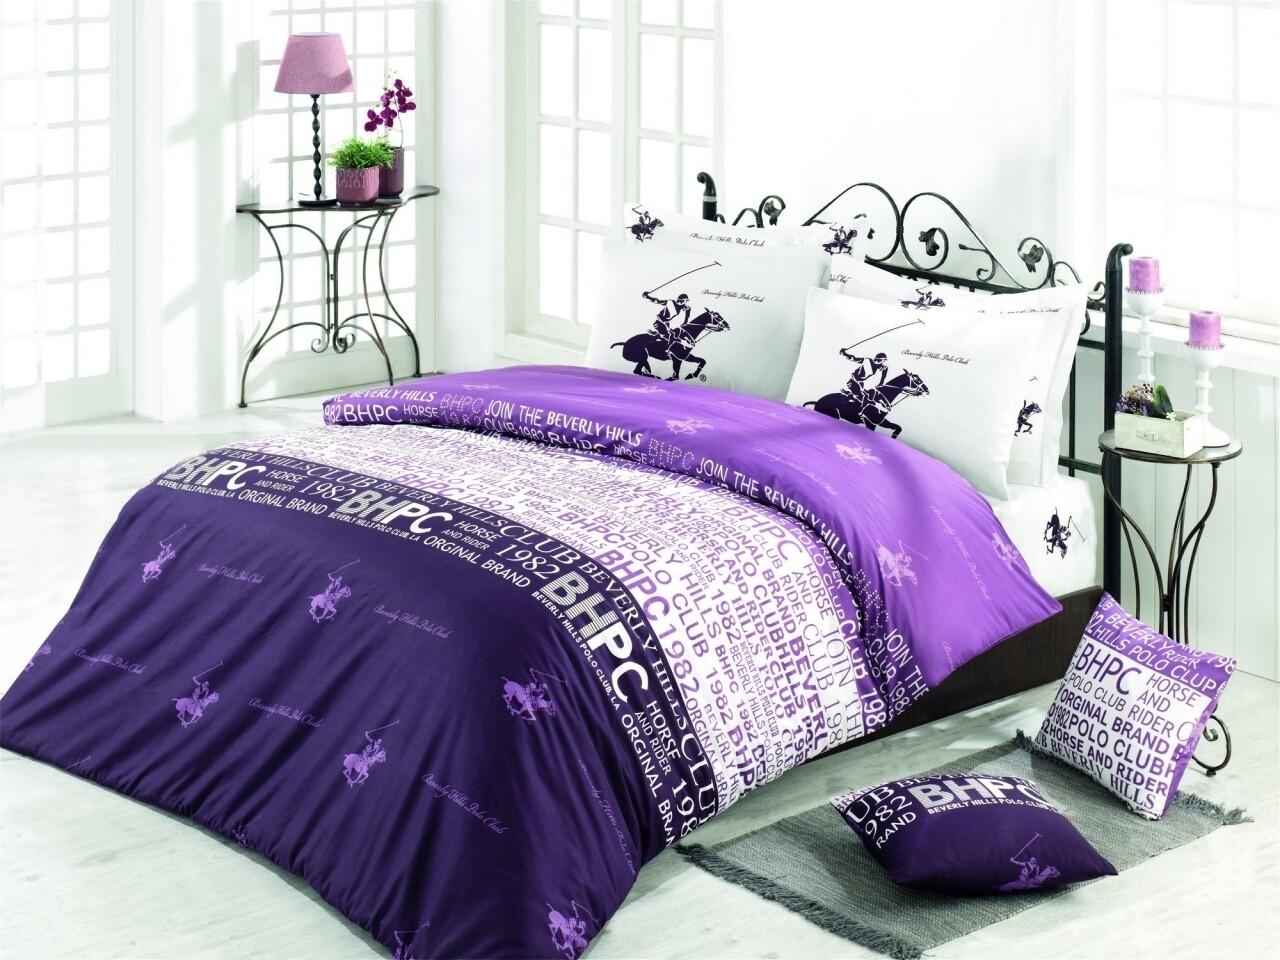 Lenjerie de pat pentru o persoana, Purple, Beverly Hills Polo Club, 3 piese, 160 x 240 cm, 100% bumbac ranforce, alb/violet